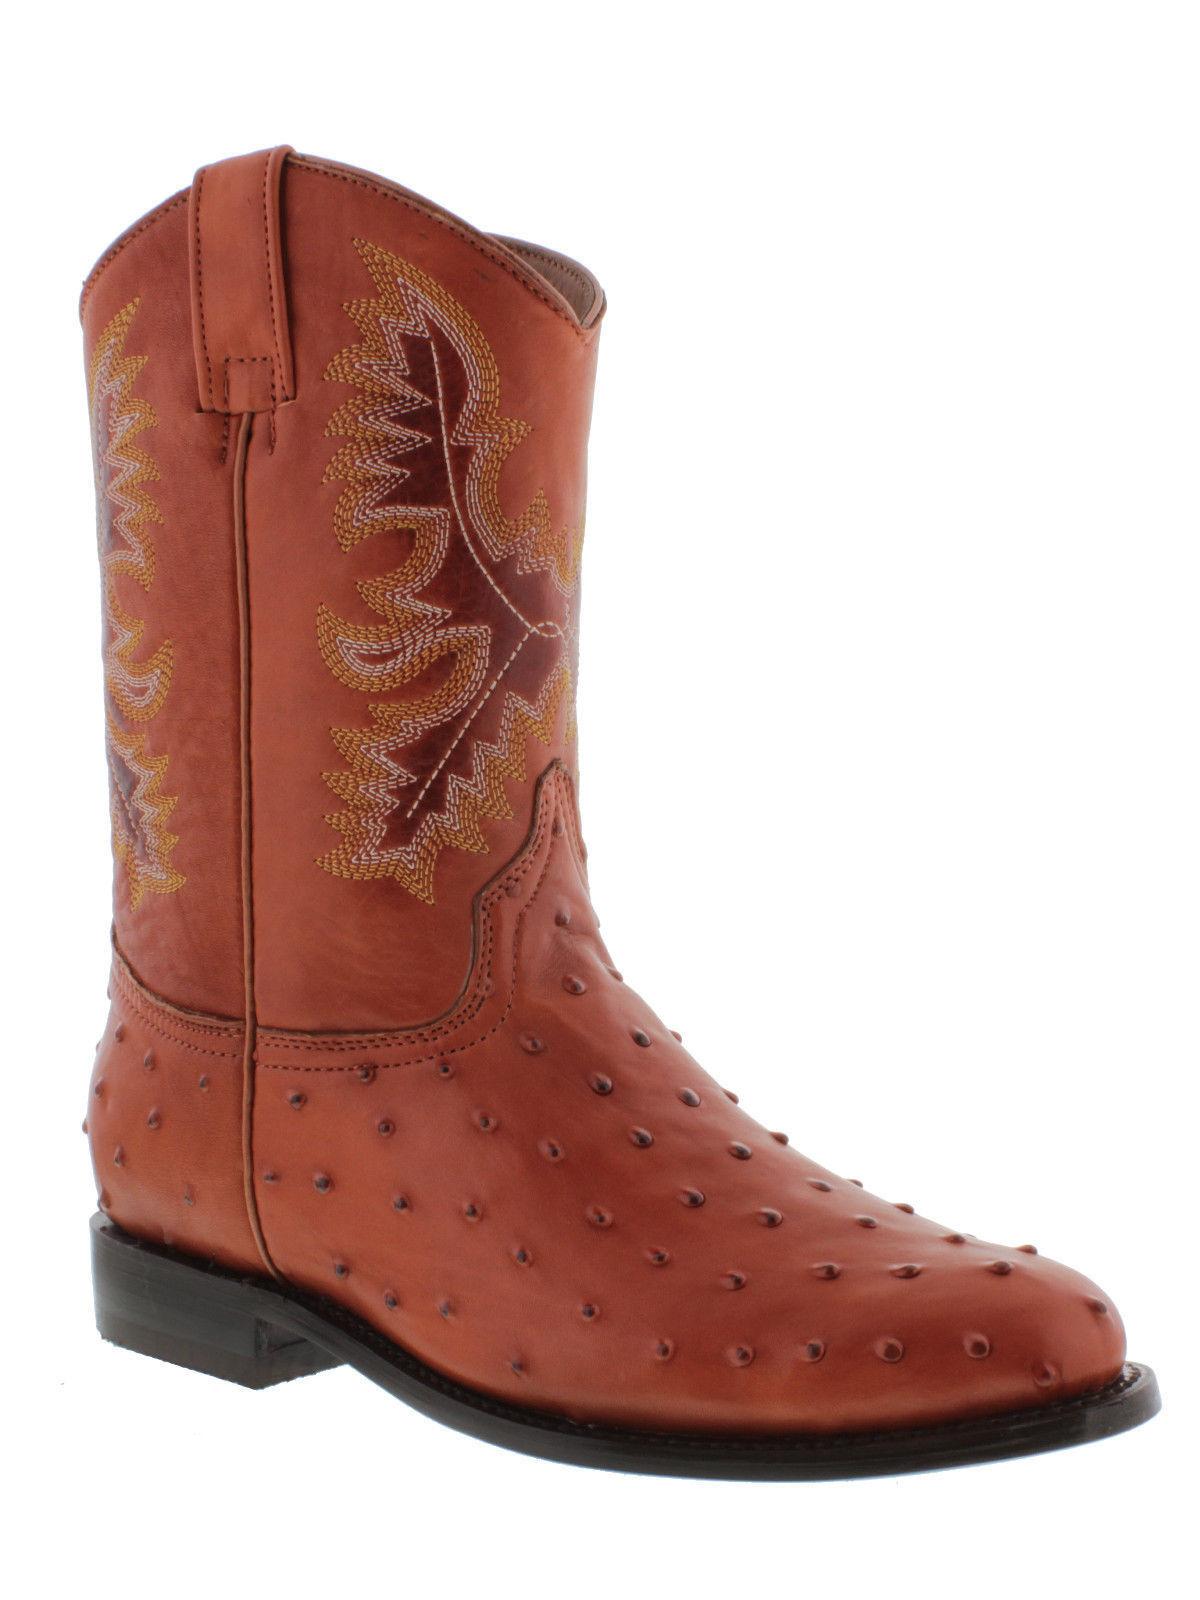 Uomo ostrich cognac brown crocodile western pelle cowboy rodeo boots roper